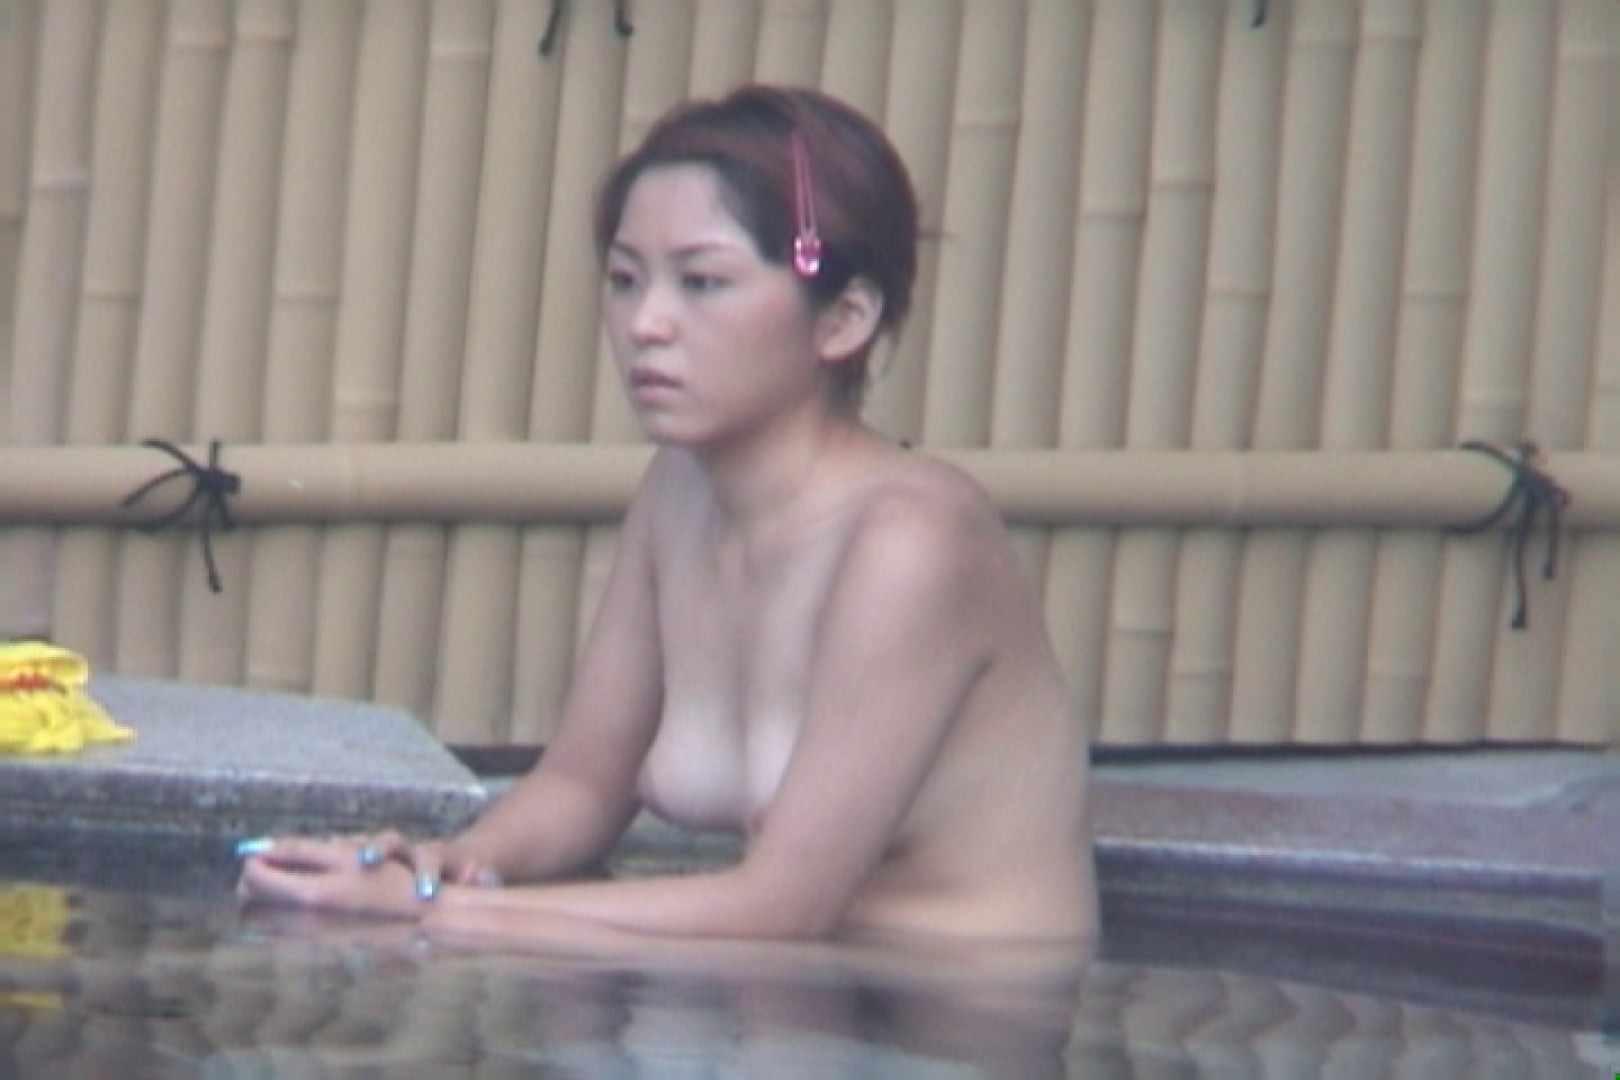 Aquaな露天風呂Vol.574 綺麗なOLたち オマンコ無修正動画無料 88枚 59